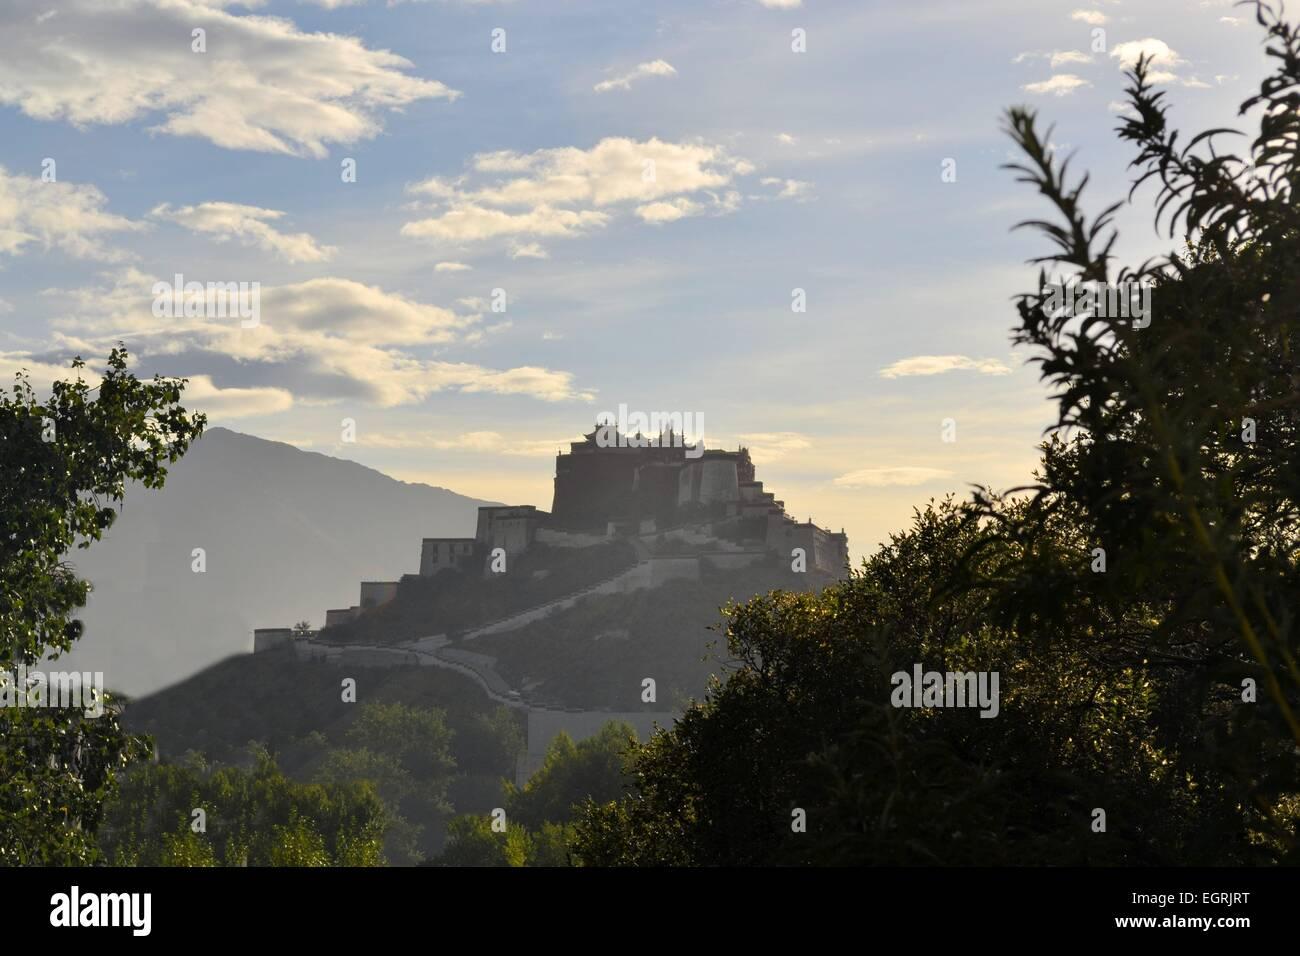 Potala Palace, former seat of Dalai Lama in Lhasa, Tibet Stock Photo